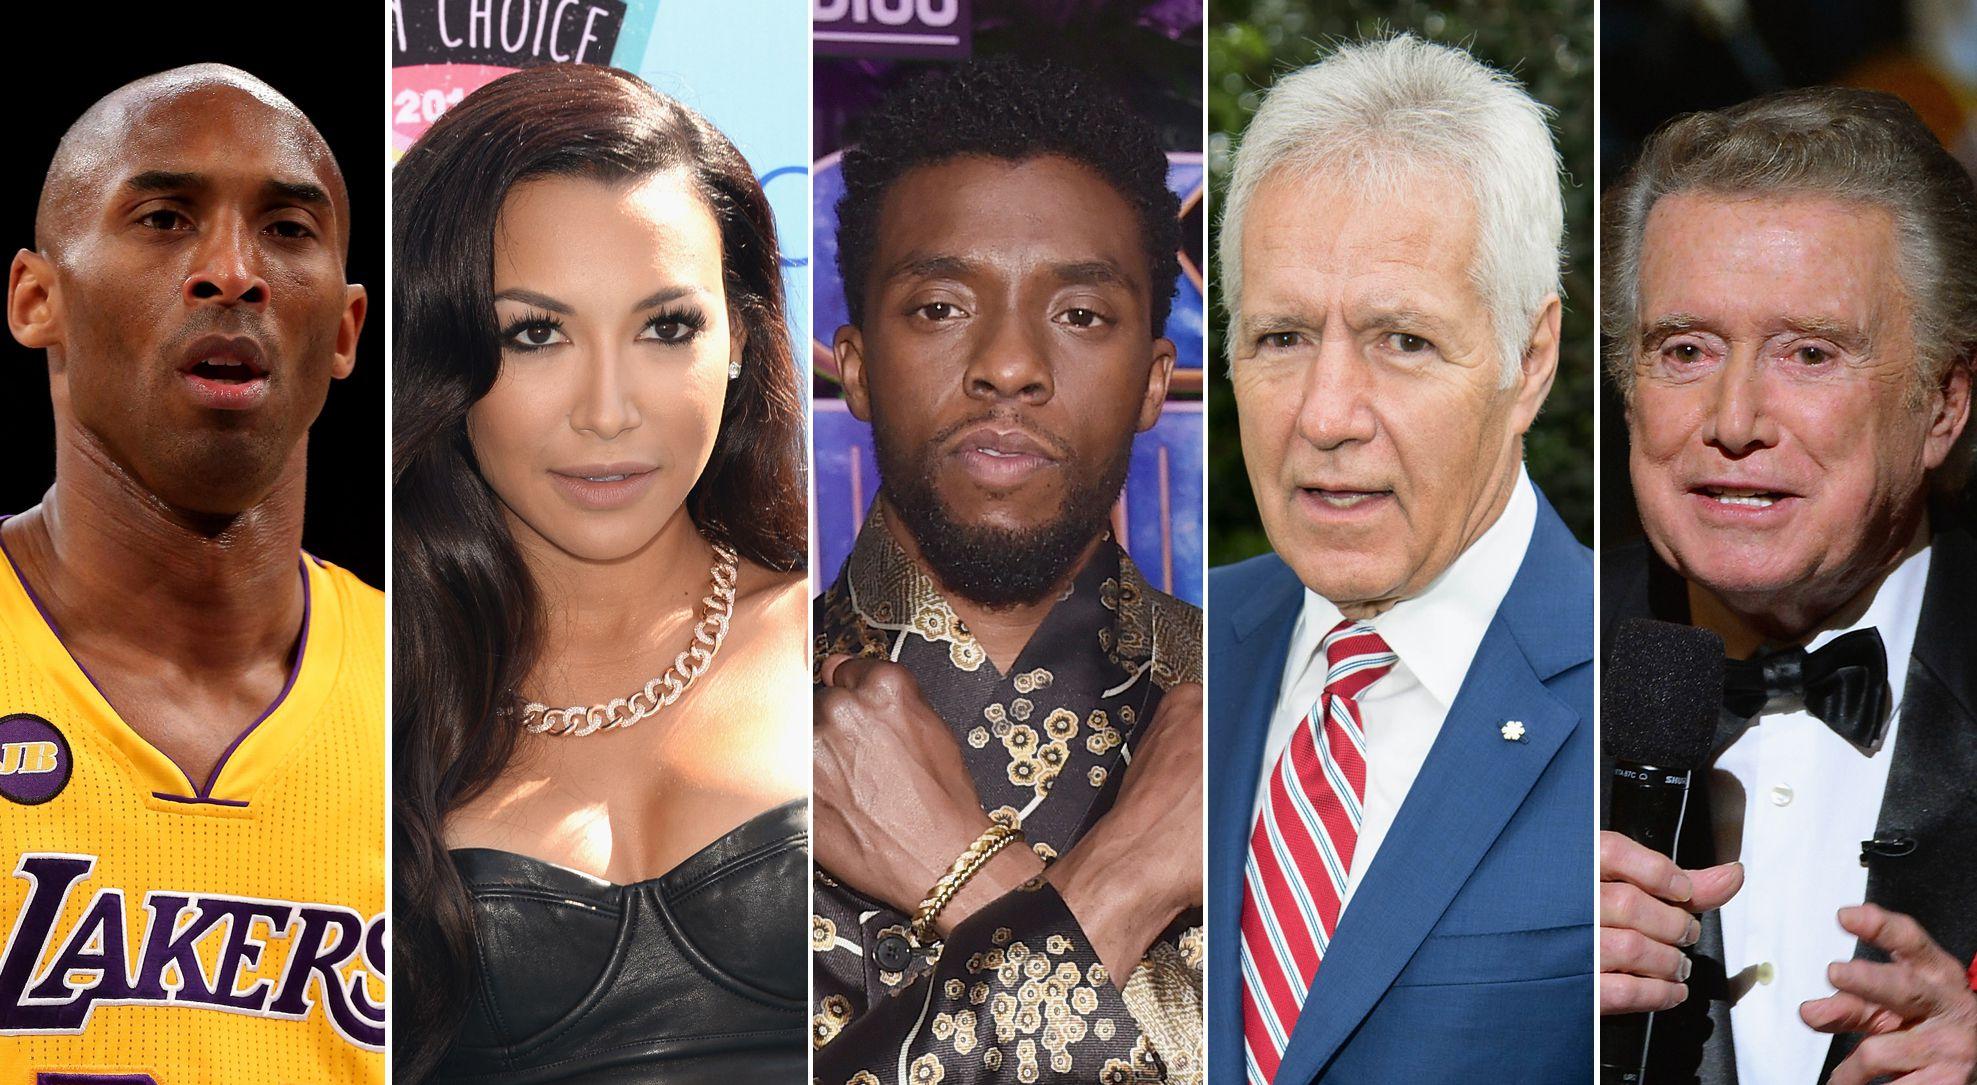 Ugly celebrities 20 showbiz: 20